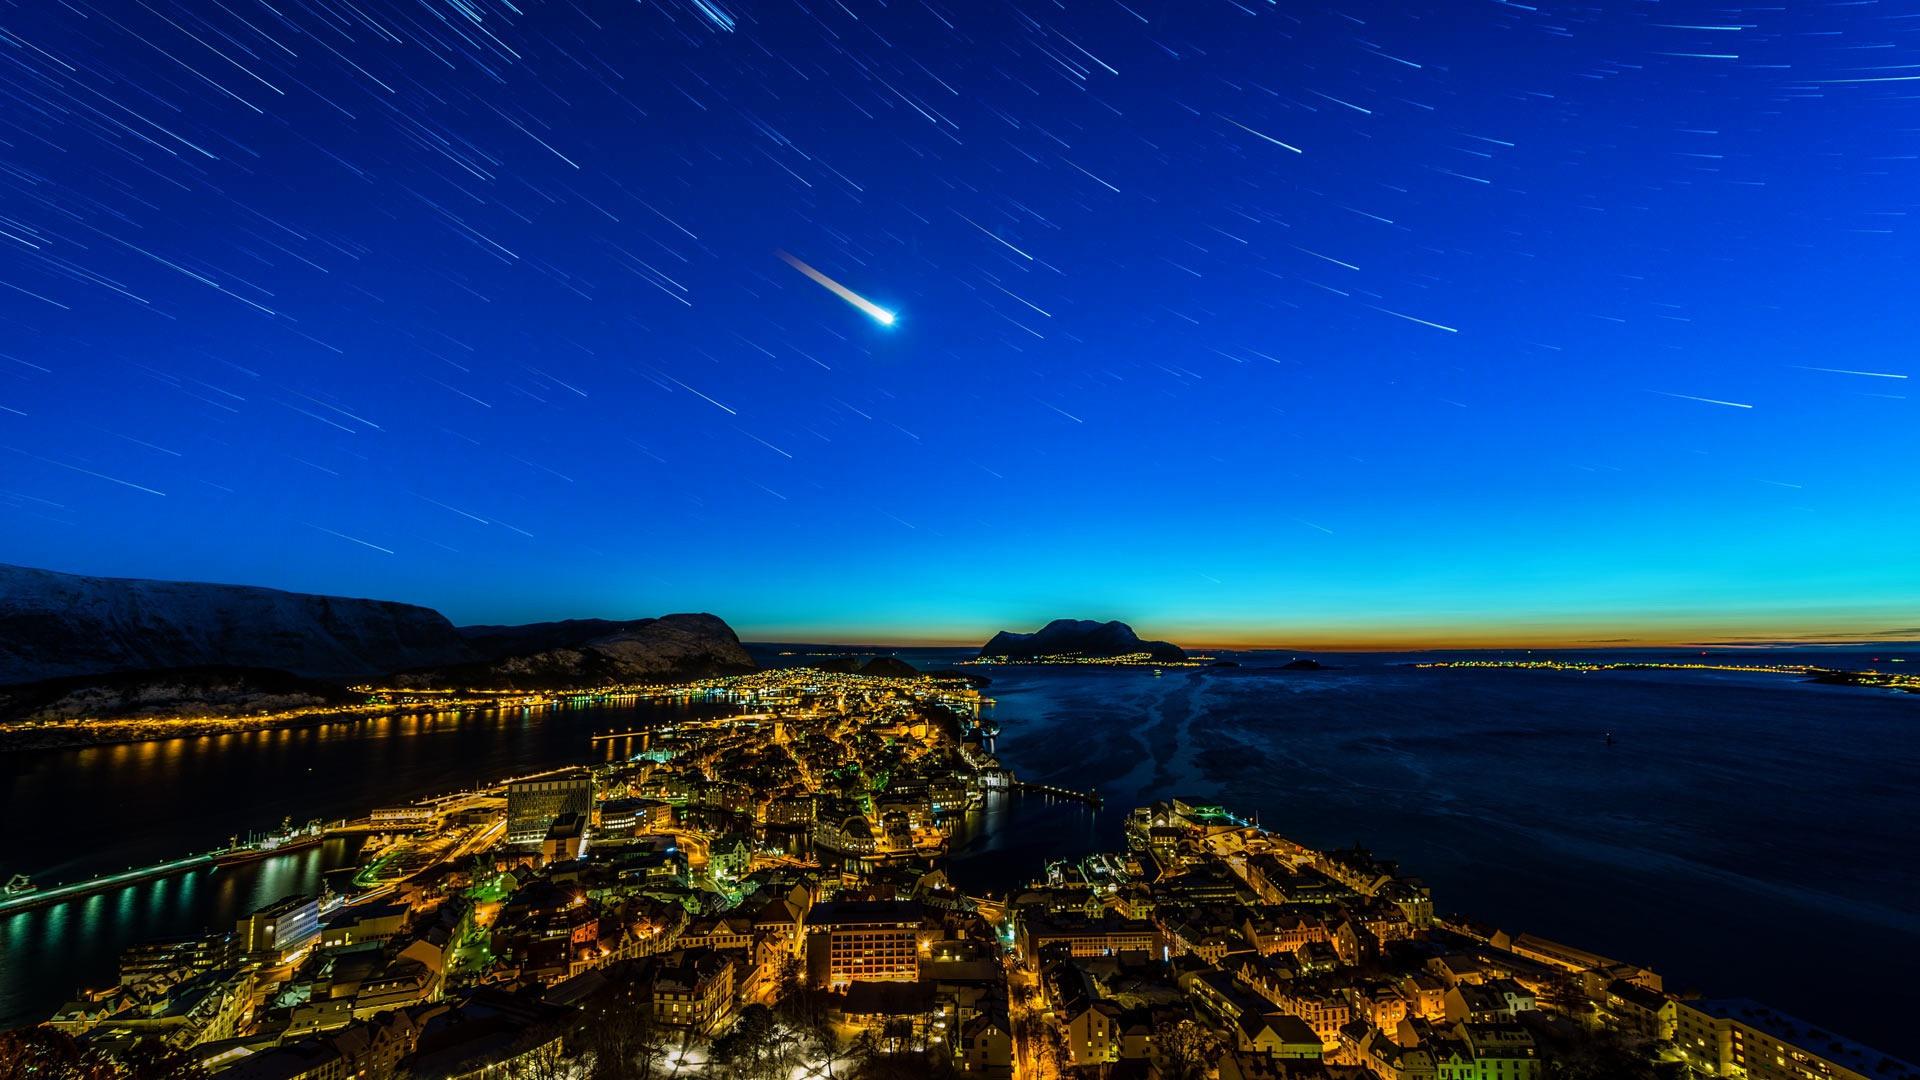 Роскошные пейзажи Норвегии - Страница 19 Architecture-building-cityscape-Norway-evening-long-exposure-city-lights-shooting-stars-mountains-water-Alesund-bridge-1230395